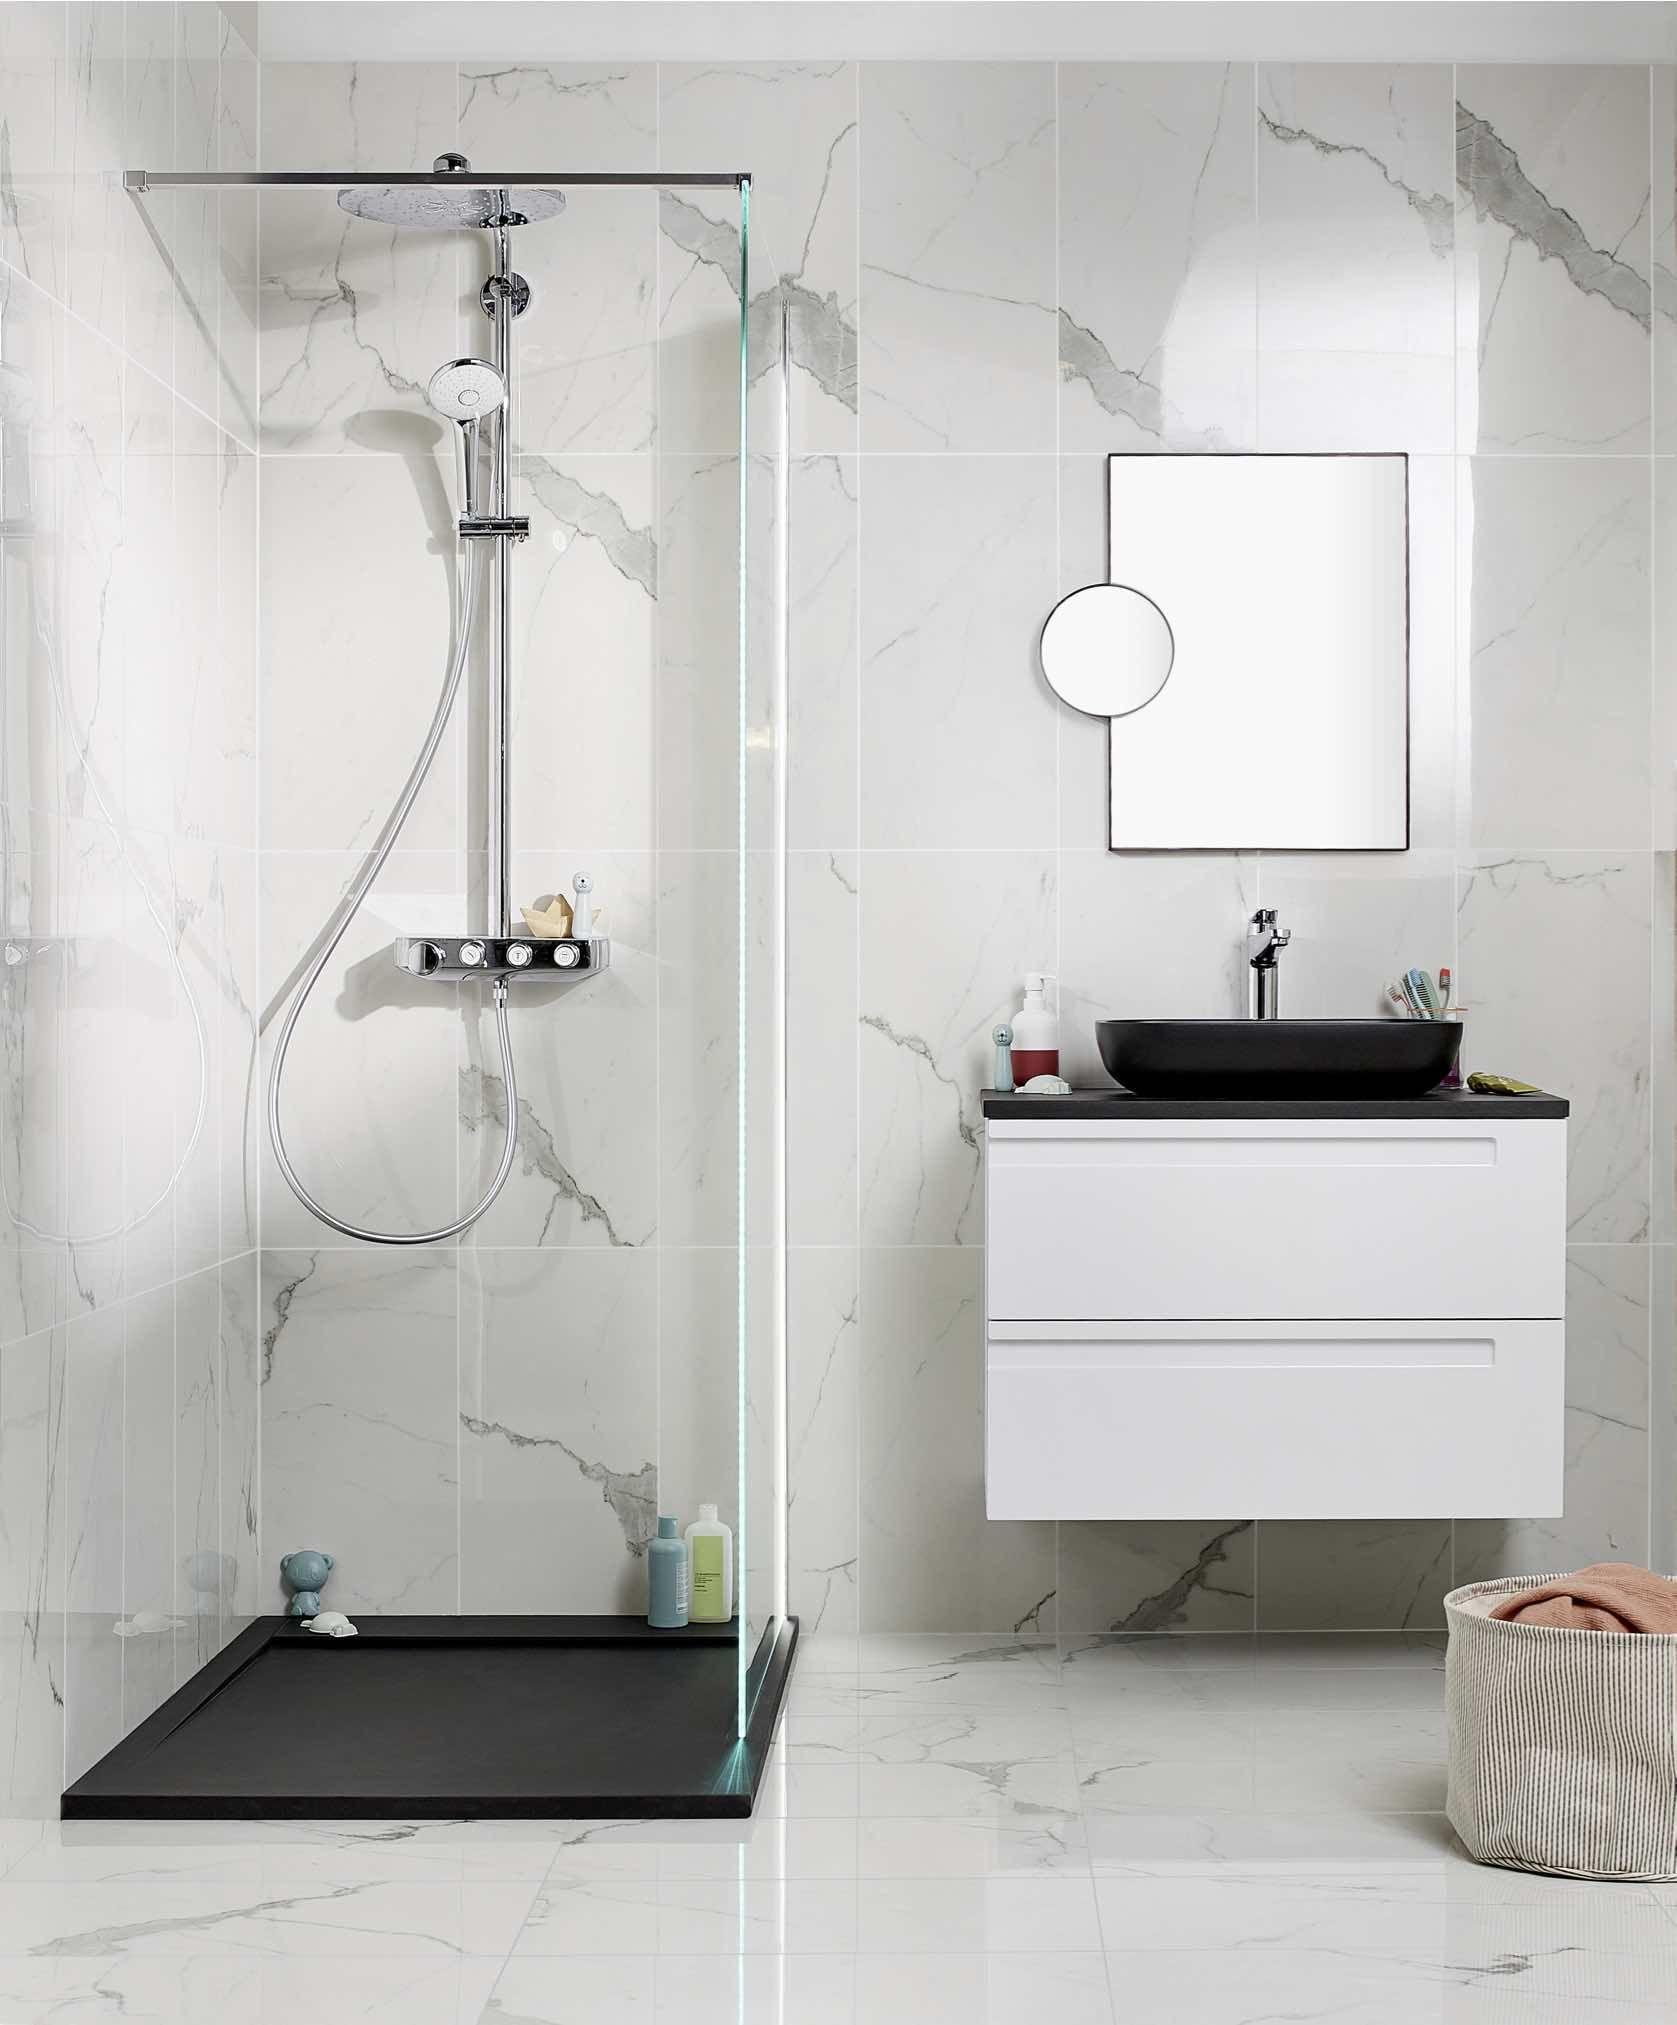 Miroir déco de salle de bains FORGE  Deco salle de bain, Miroir